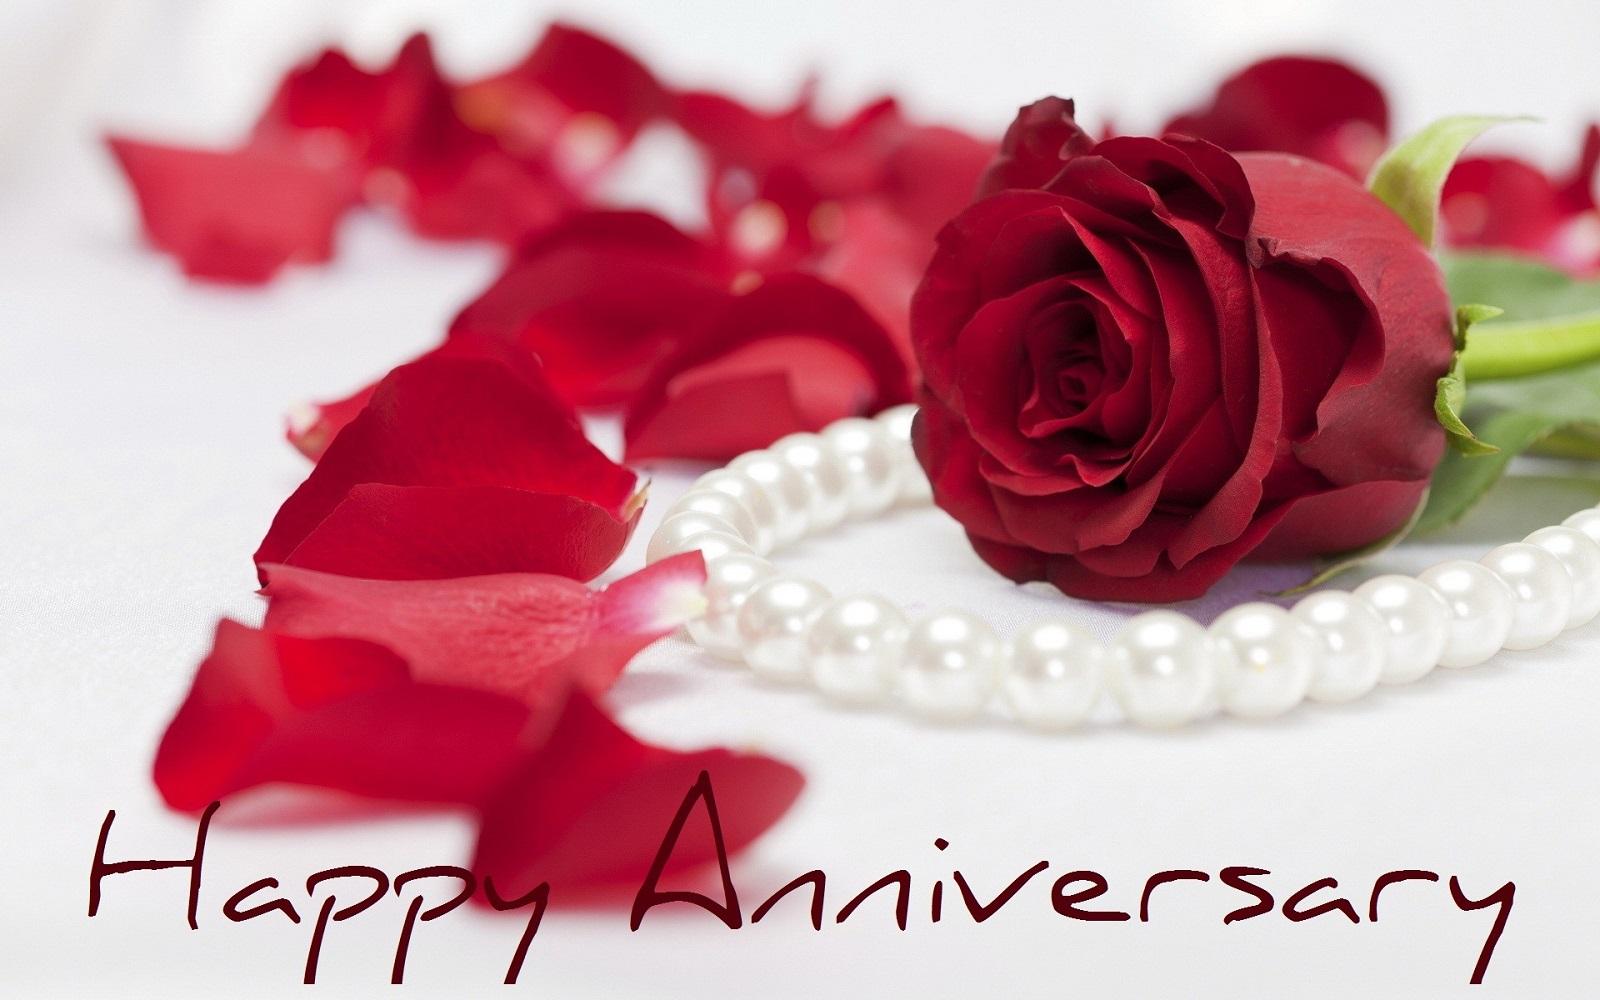 Wonderful Wallpaper Love Anniversary - euJKRm  Collection_41469.jpg